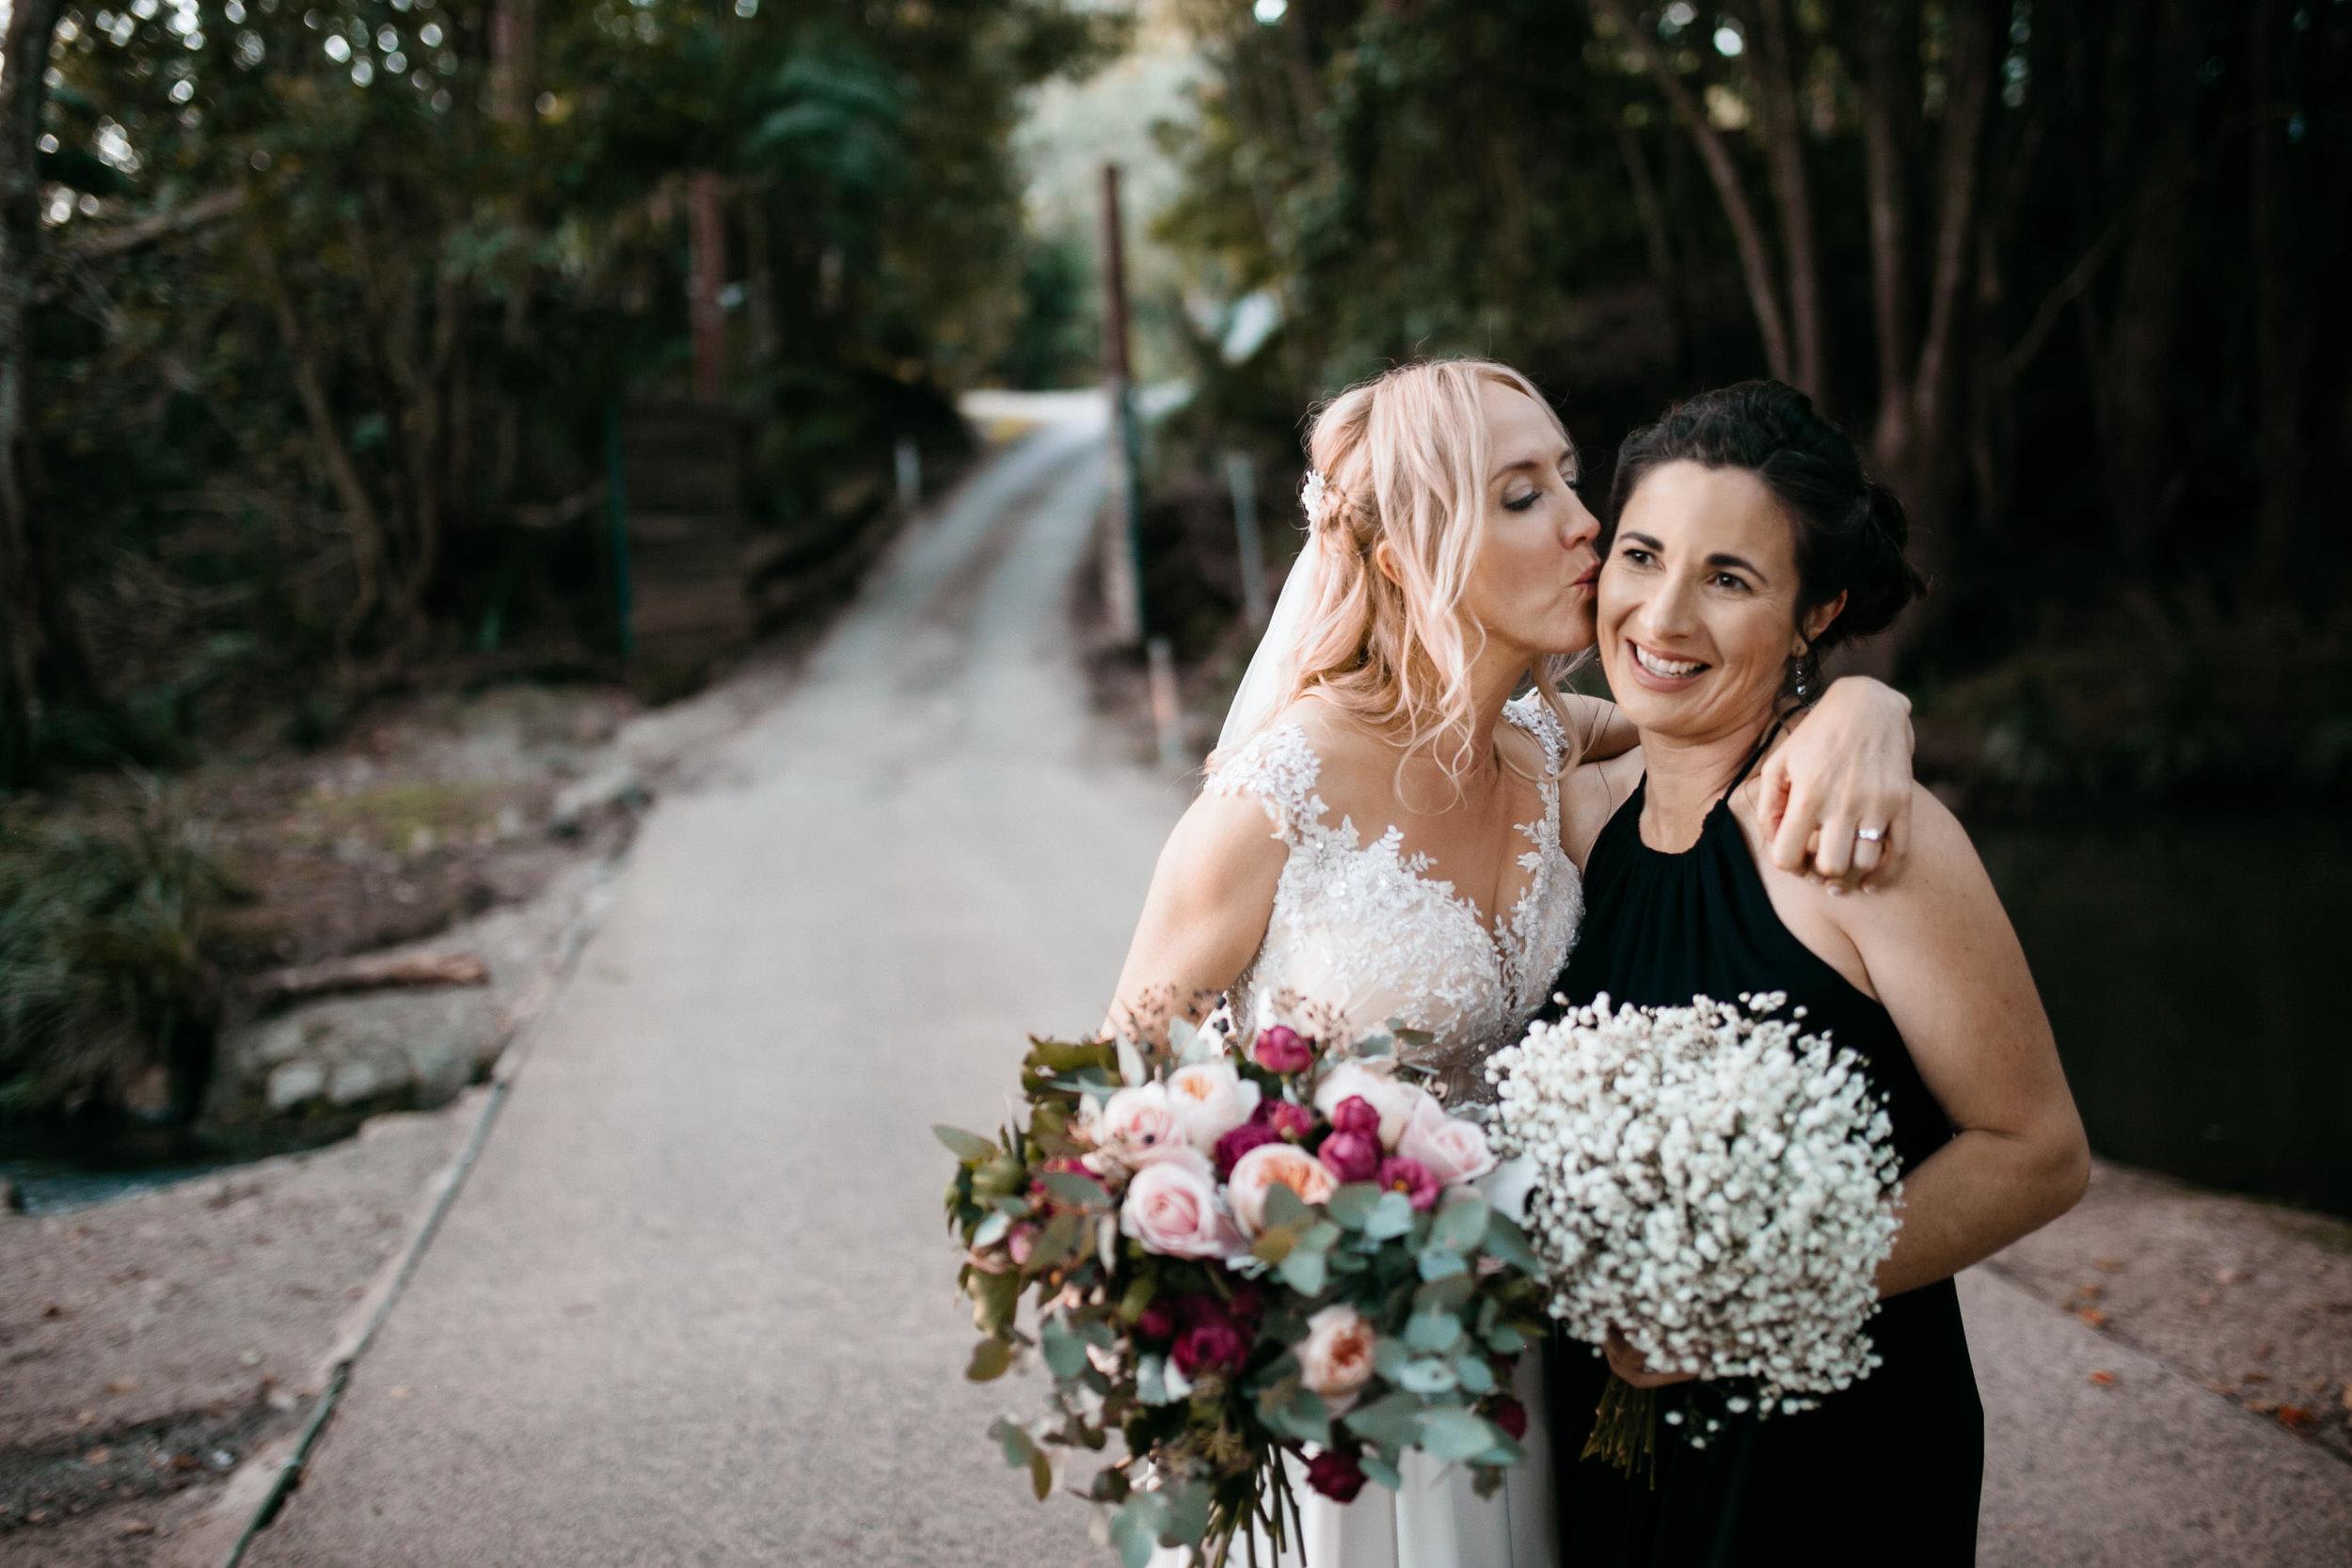 True North Photography_Boomerang Farm_Stacey and Isaac_Gold Coast Wedding_Barm Wedding_Hinterland Wedding-154.jpg